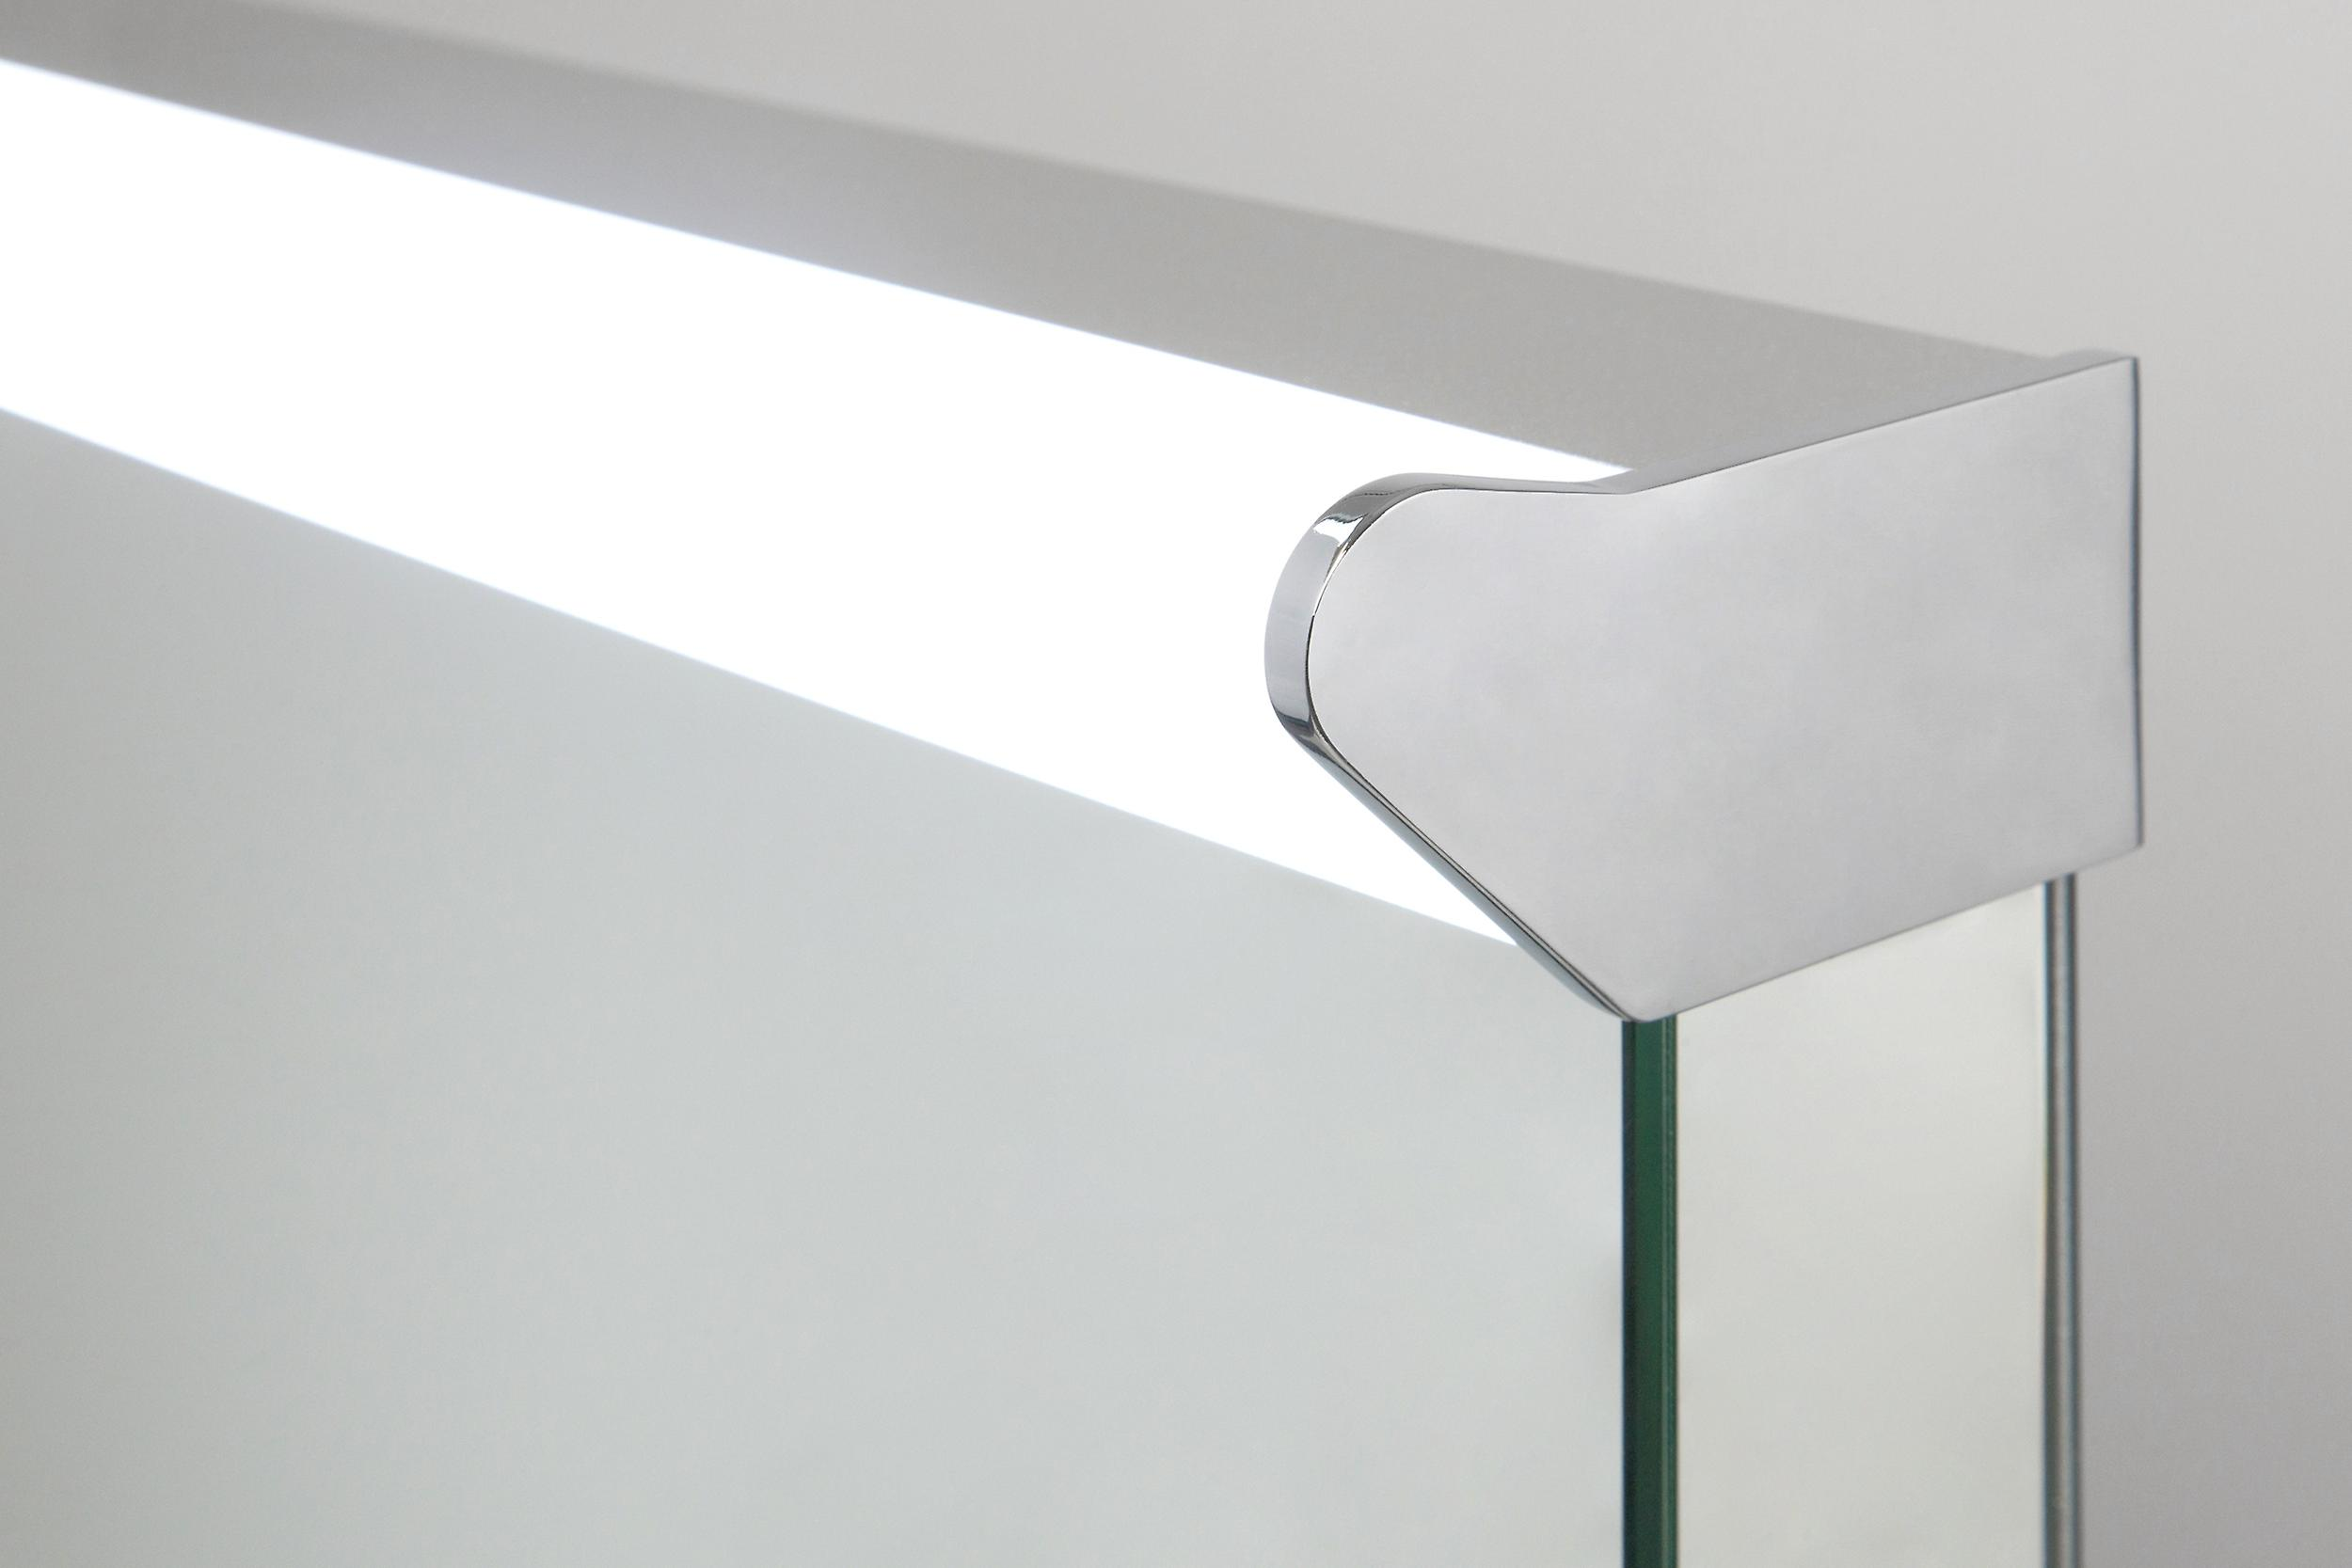 Sirius Top Light LED salle de bain miroir avec dévésiculeur Pad & Sensor k474